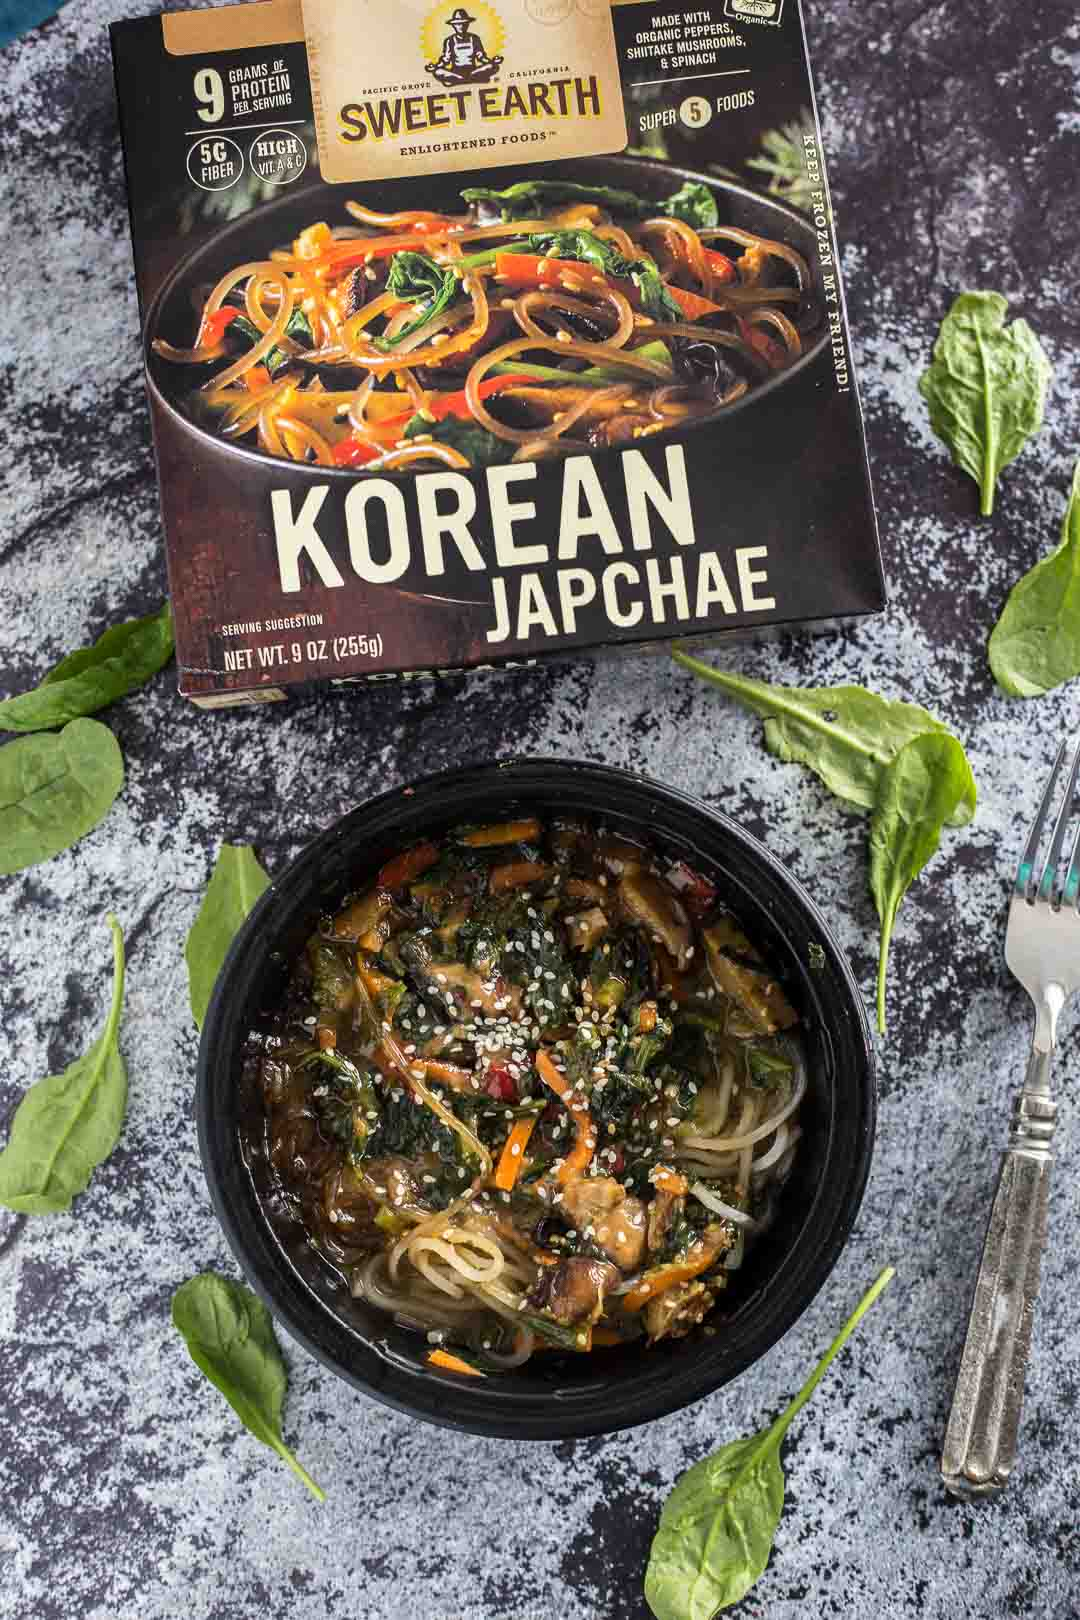 Sweet Earth Korean Japchae